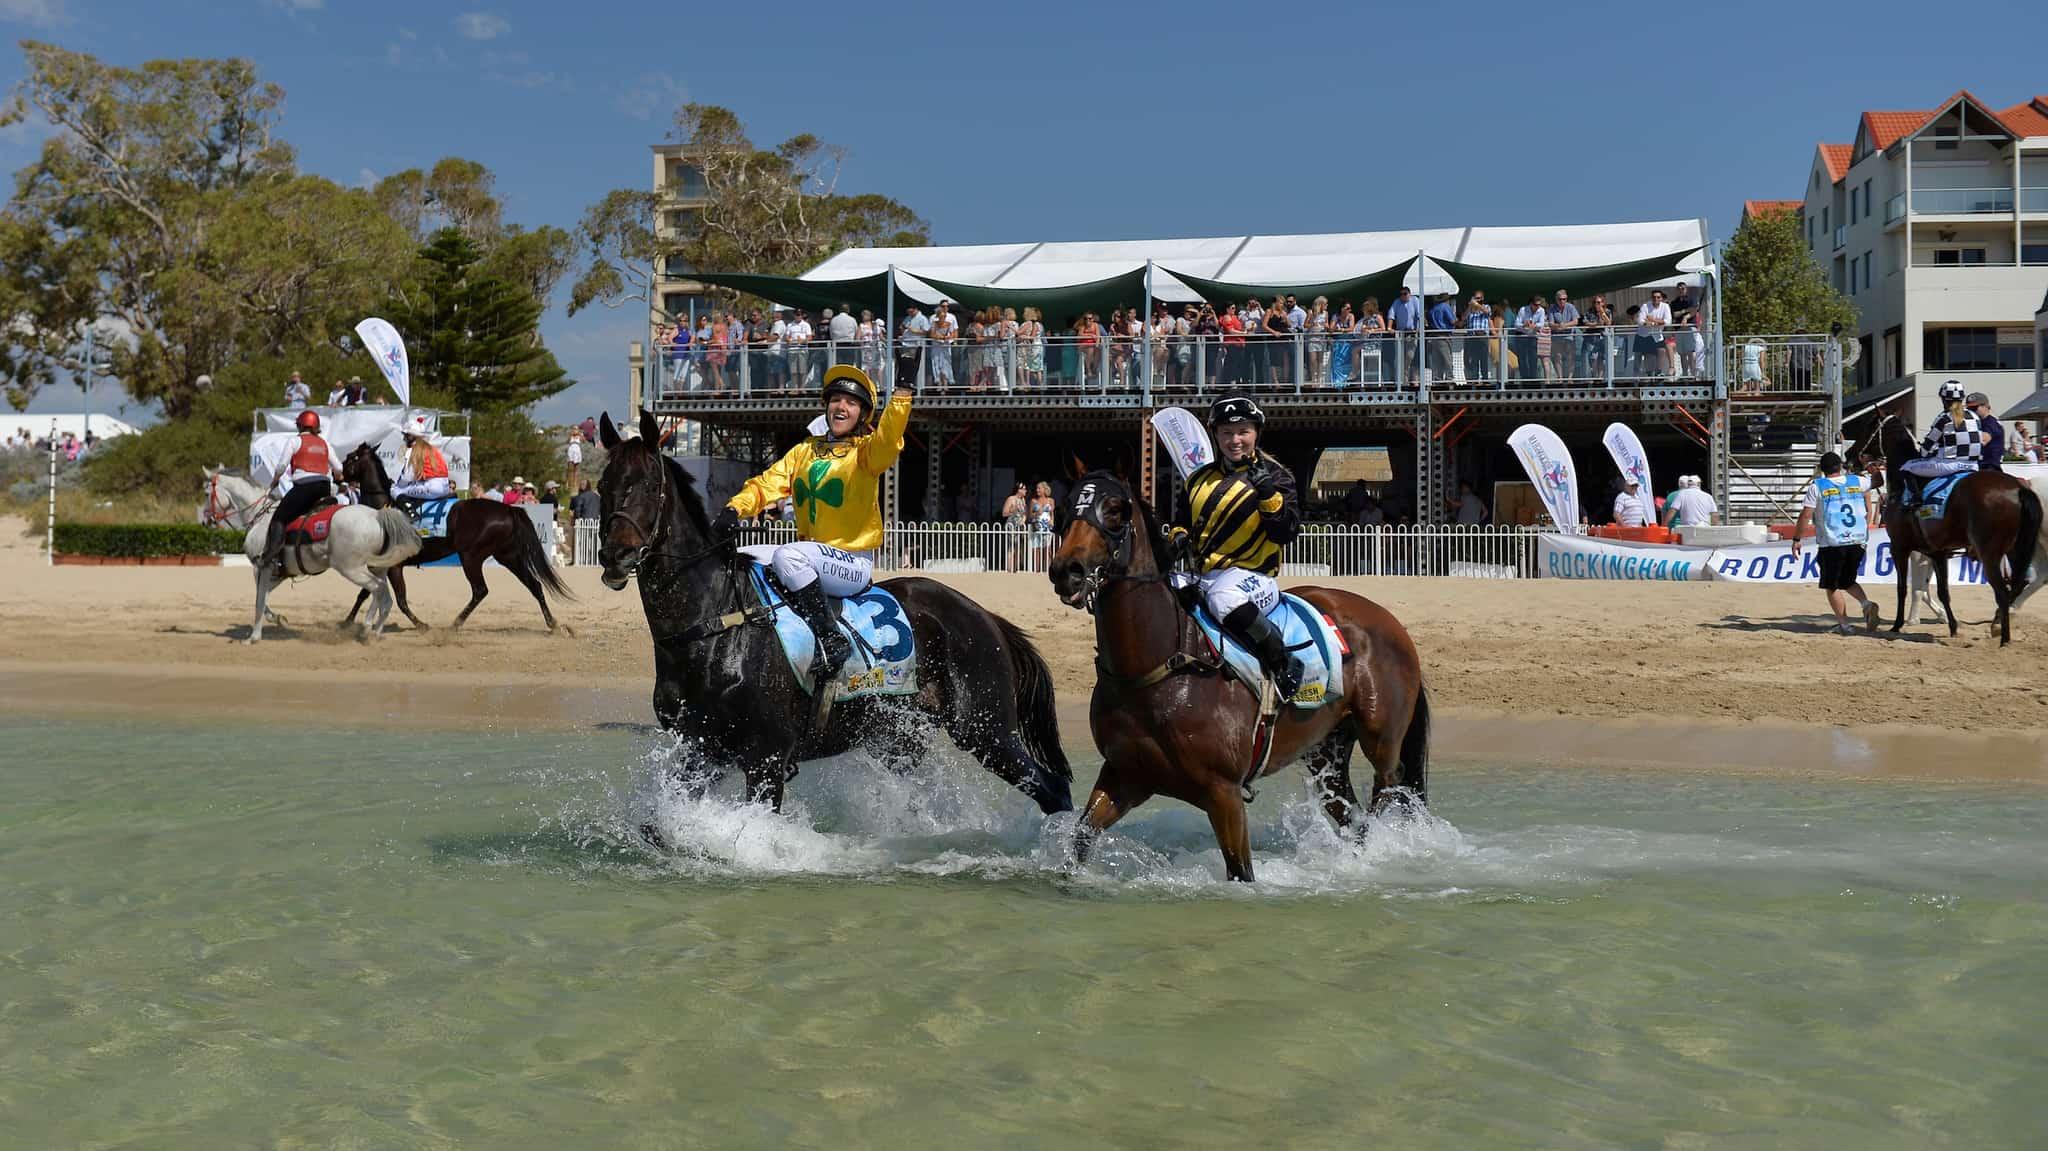 131 2017-Rockingham Beach Cup-RACE DAY